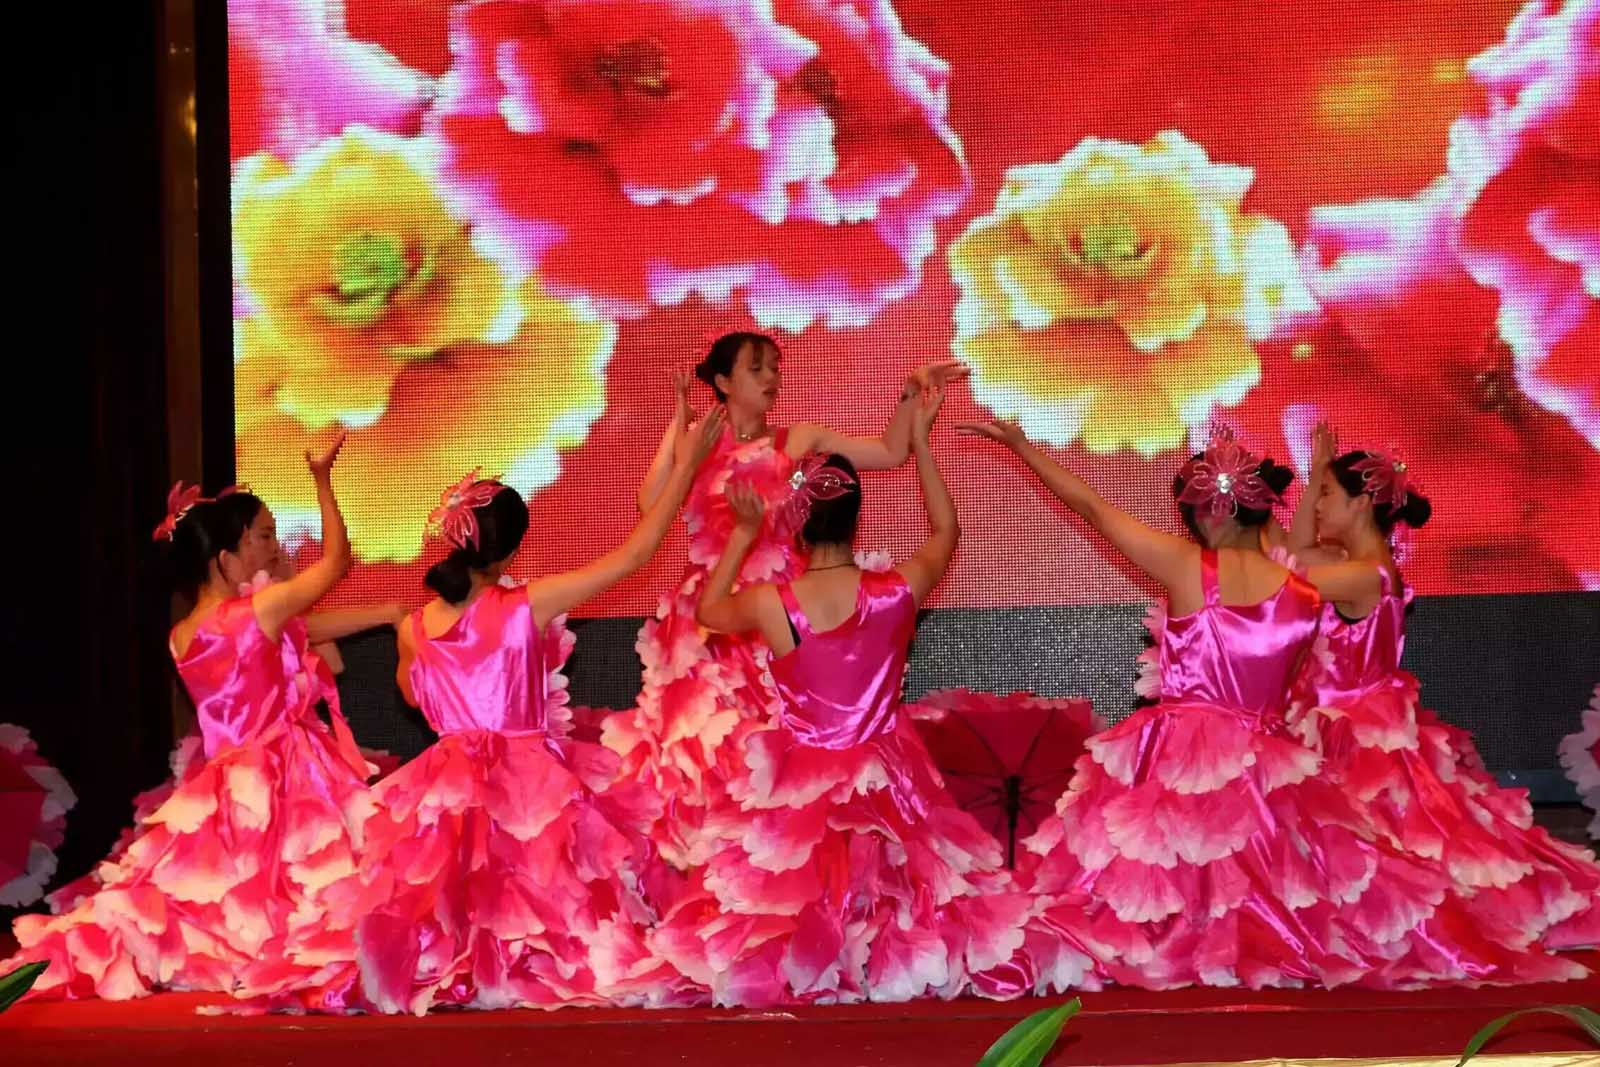 Female employee perform dancing